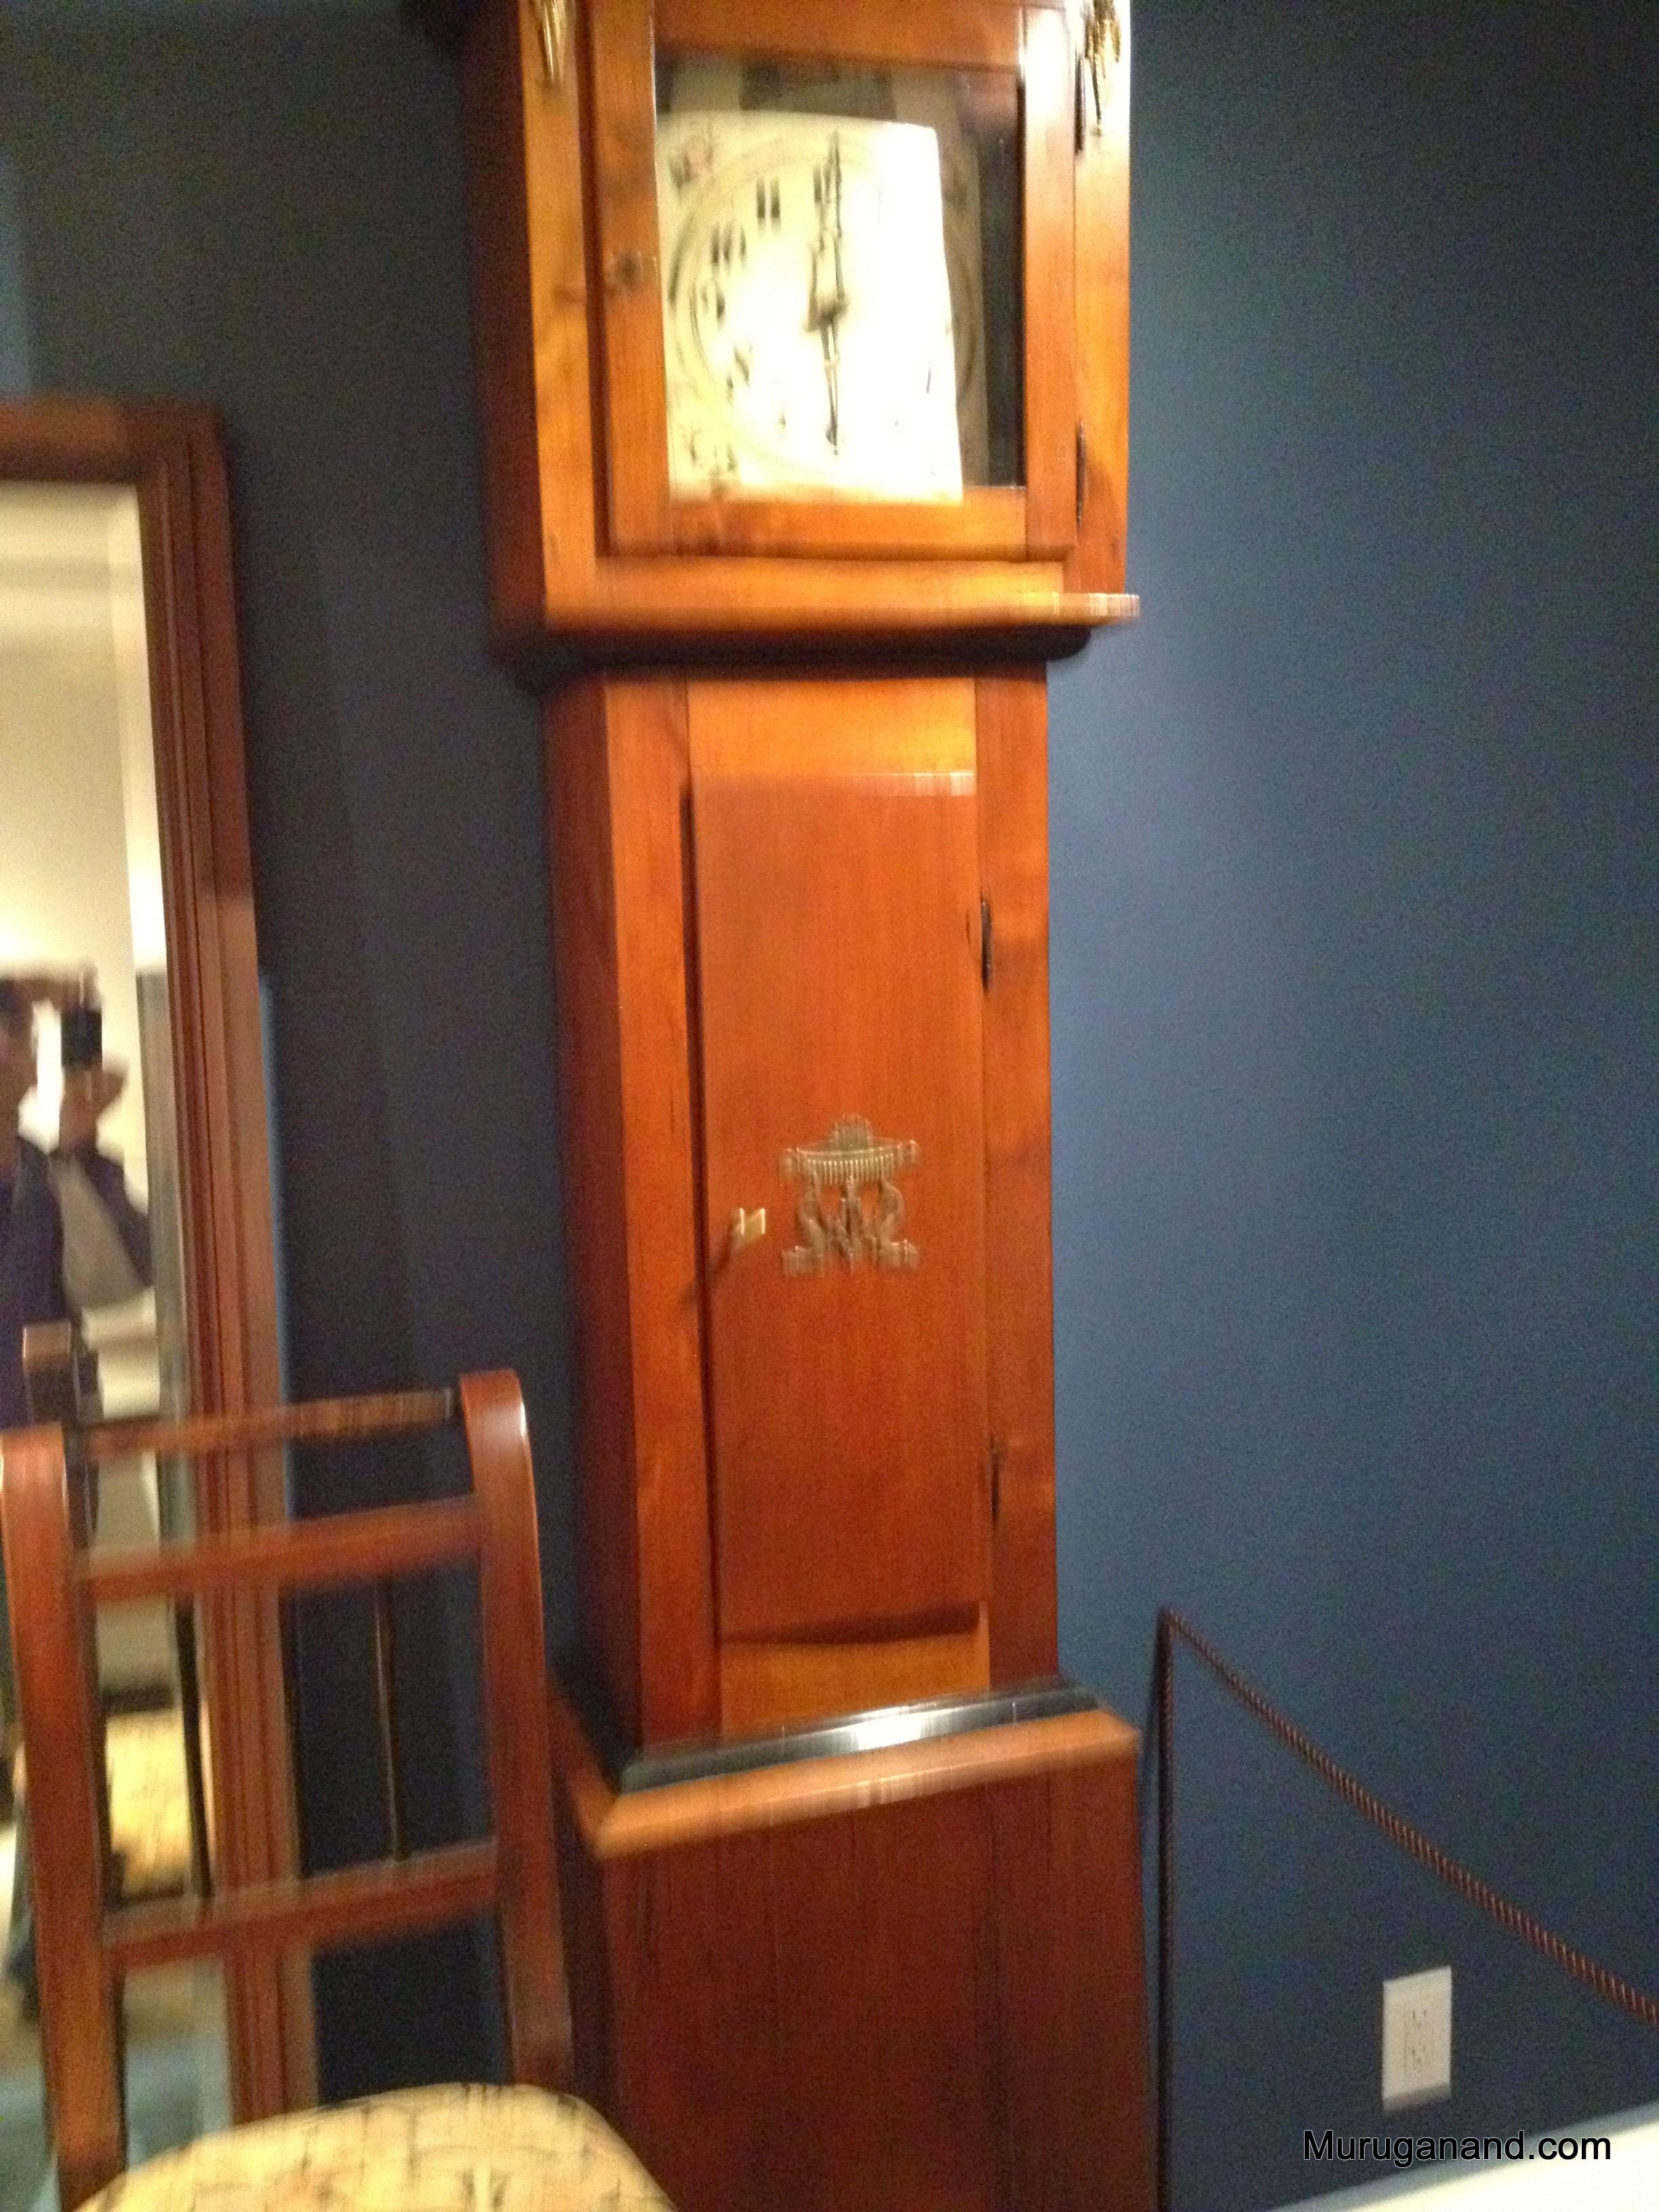 Tall case clock (1830's)